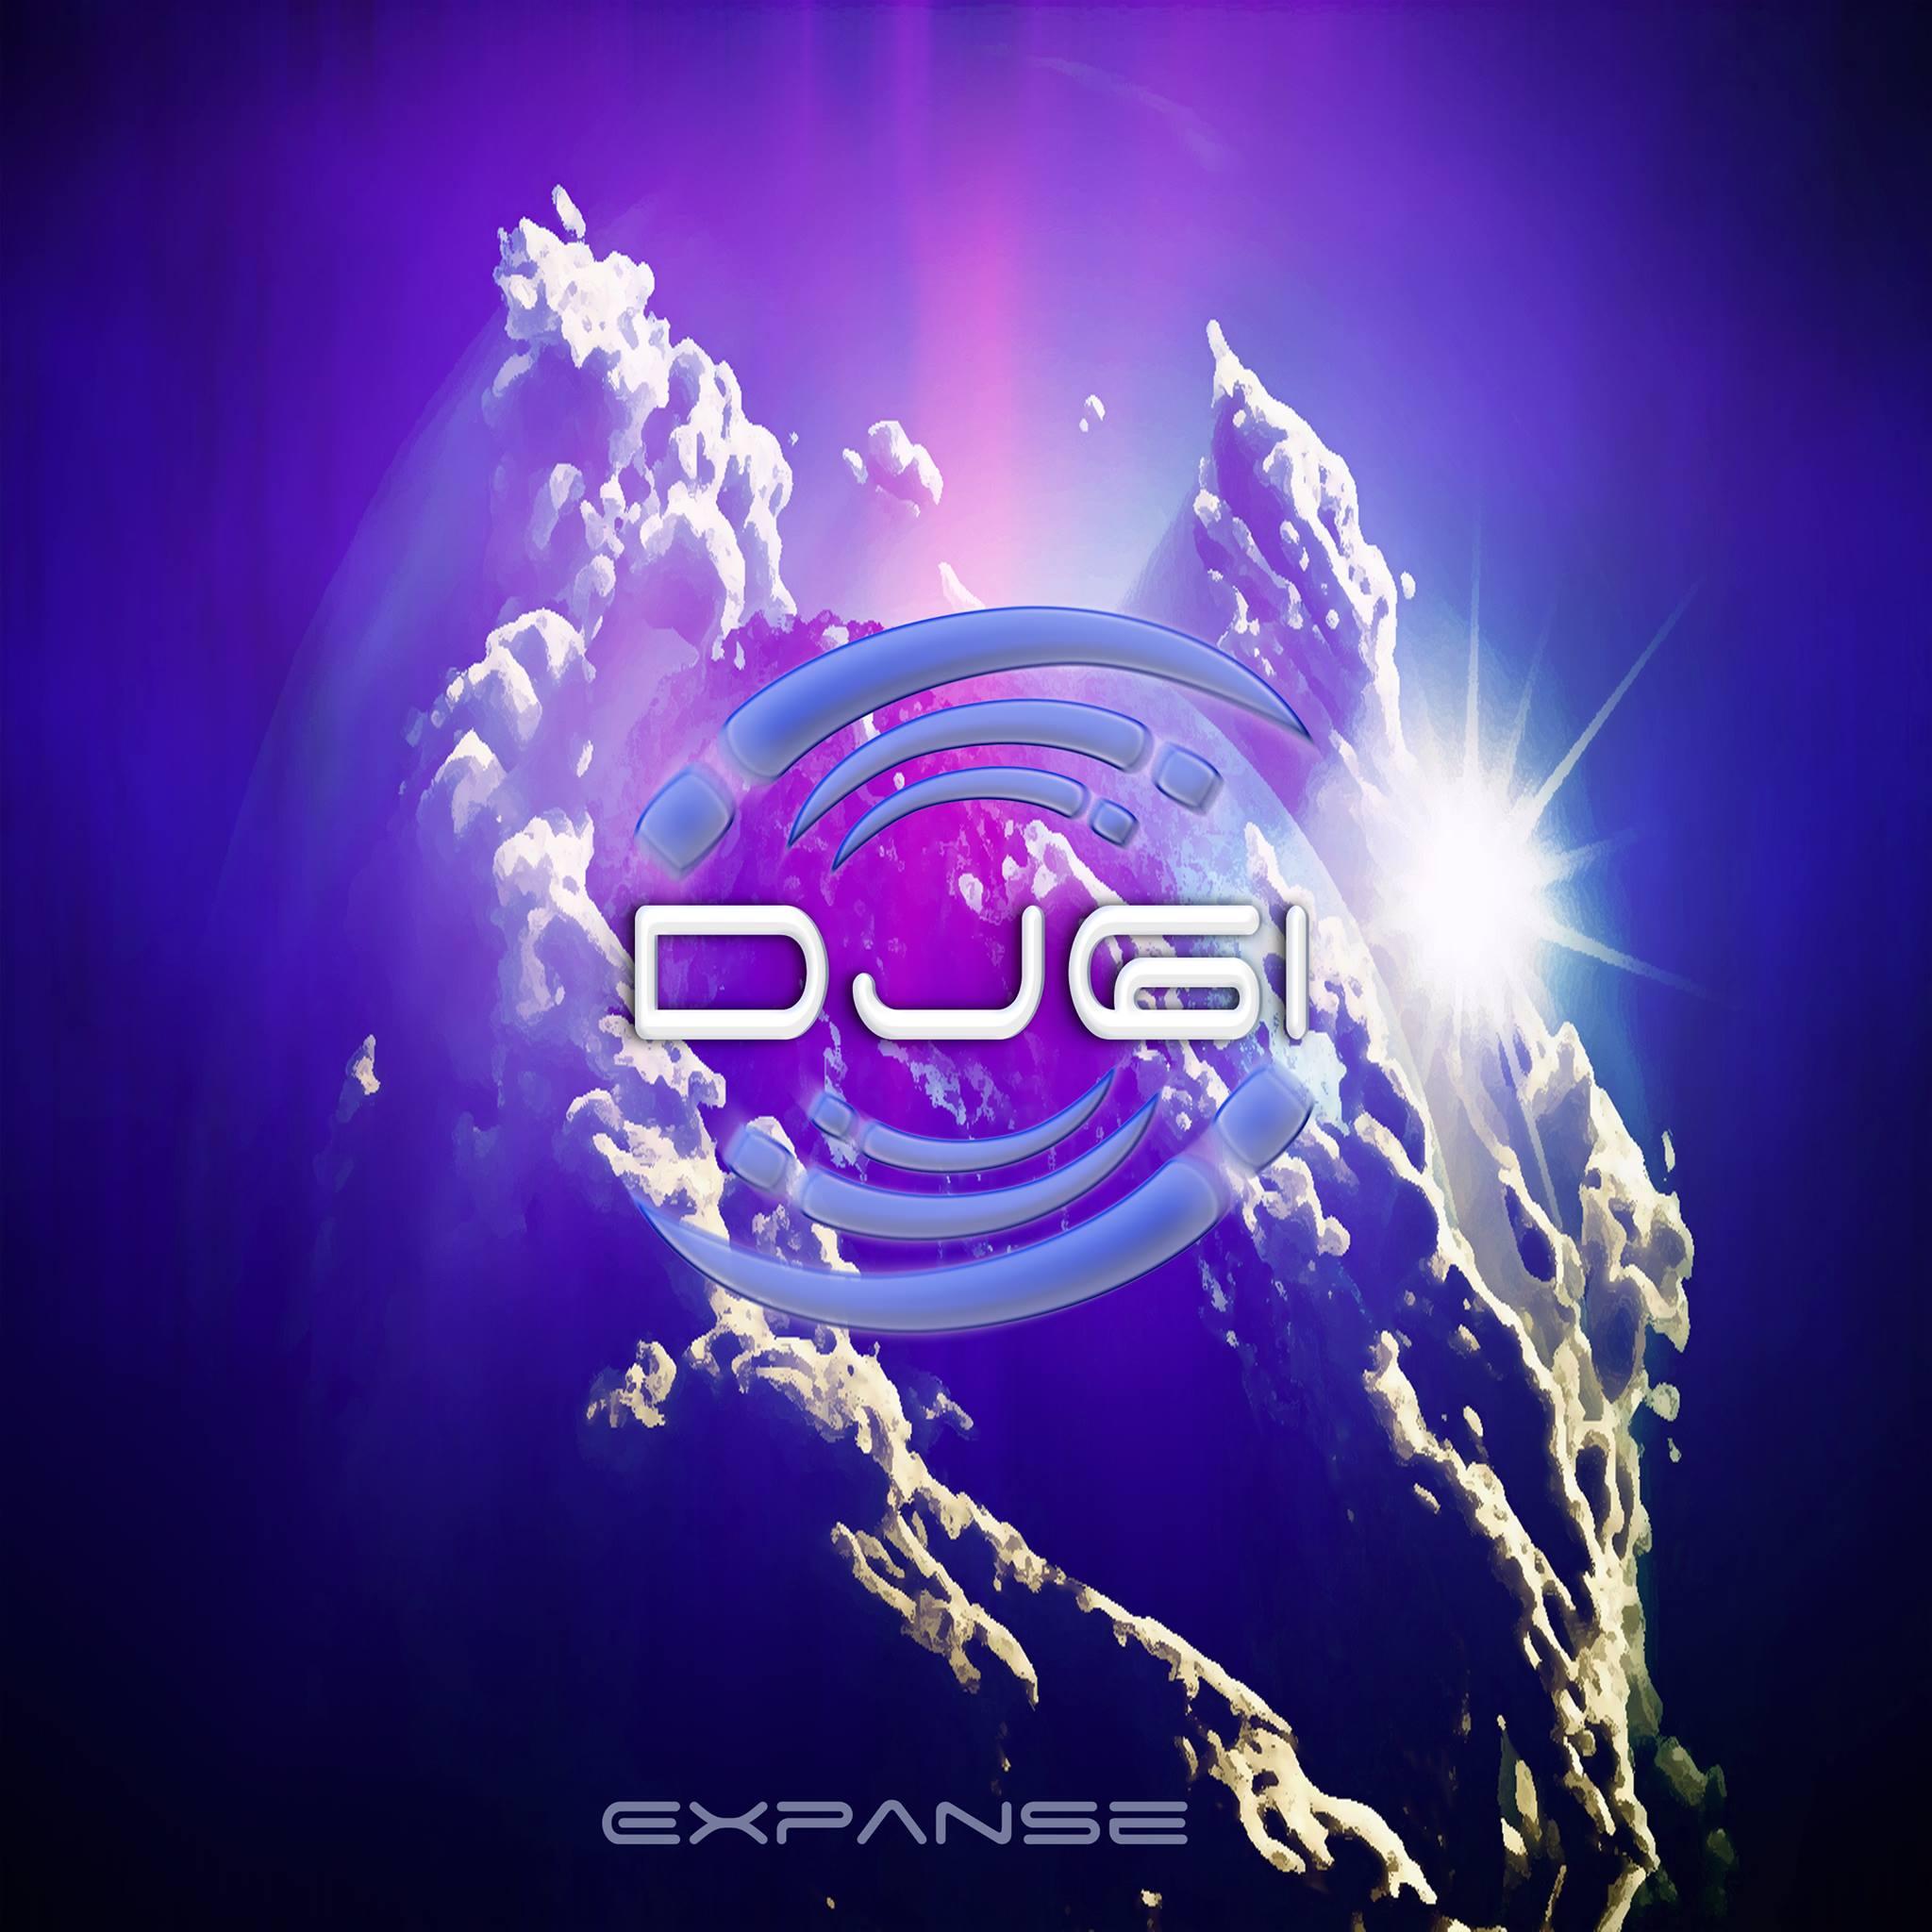 purple image for DJ6i's albume expanse